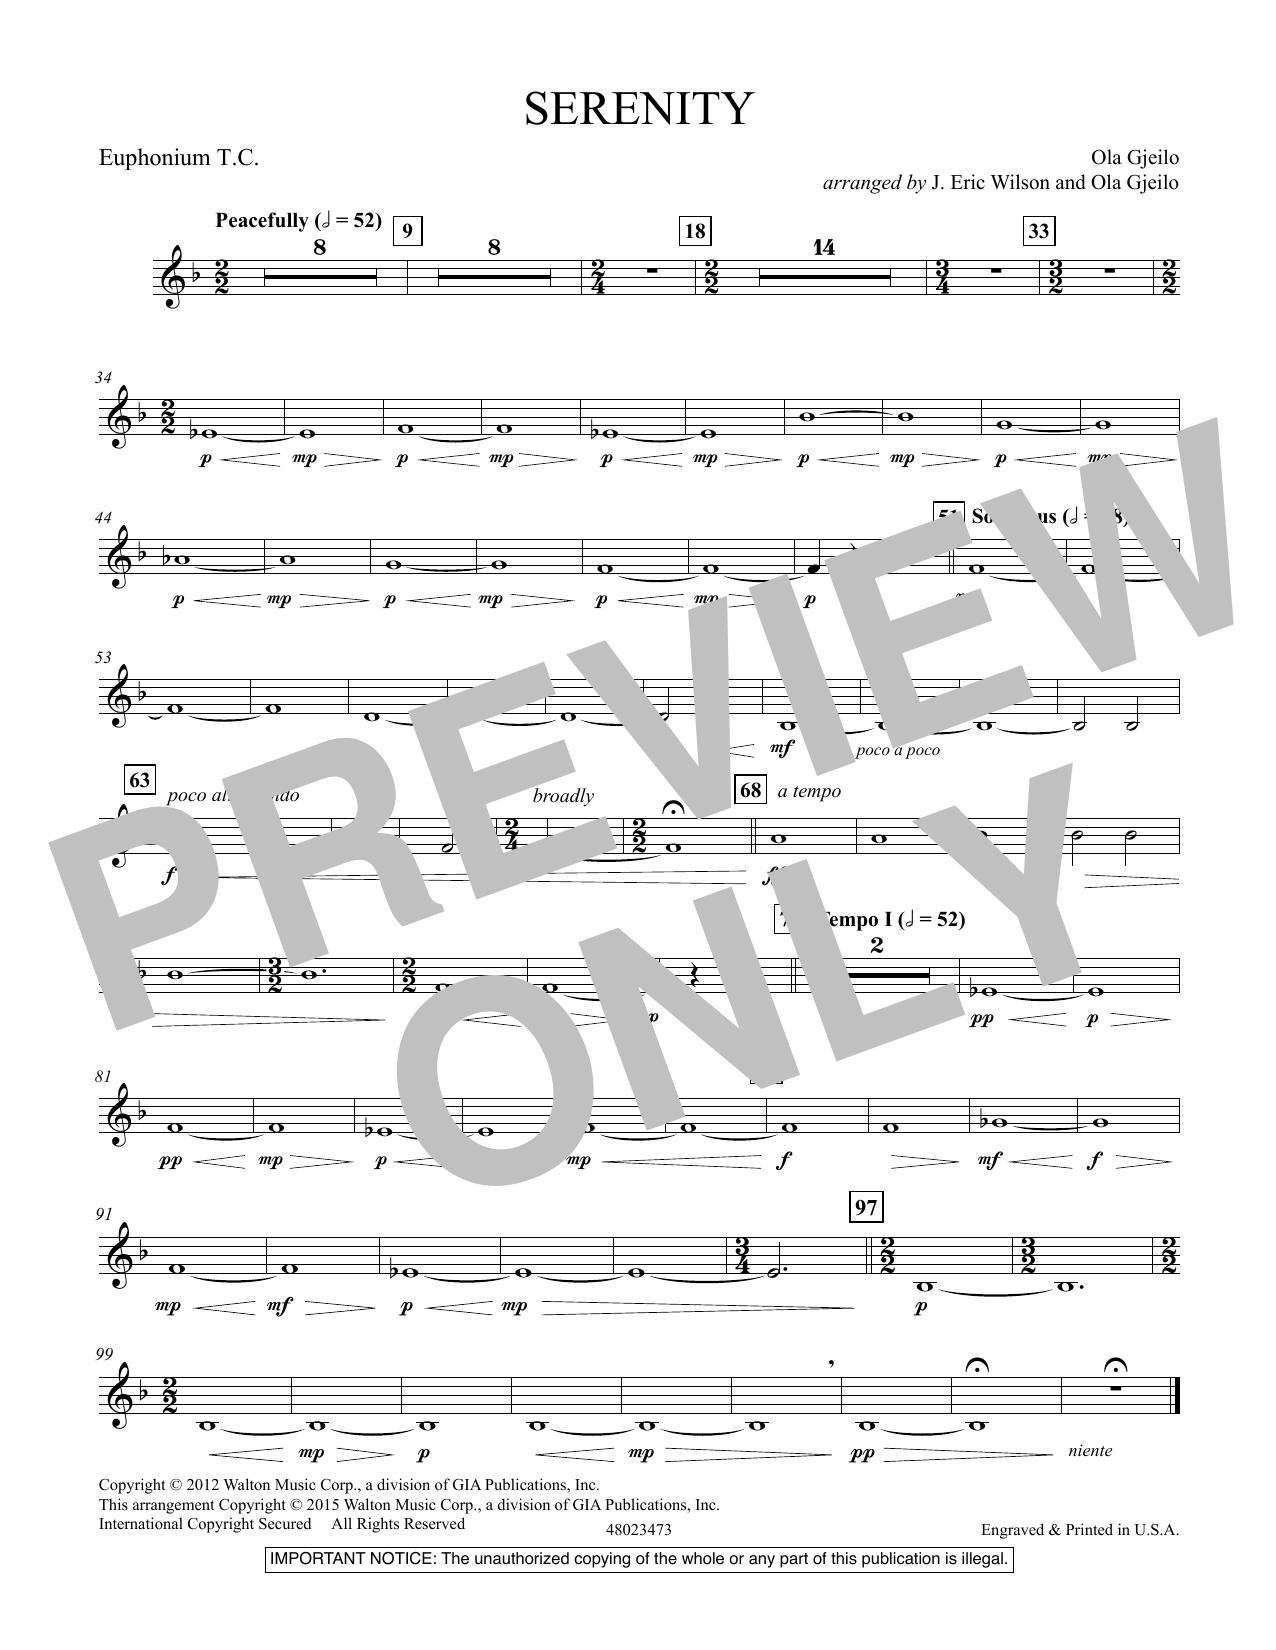 Serenity - Euphonium T.C. (Concert Band)